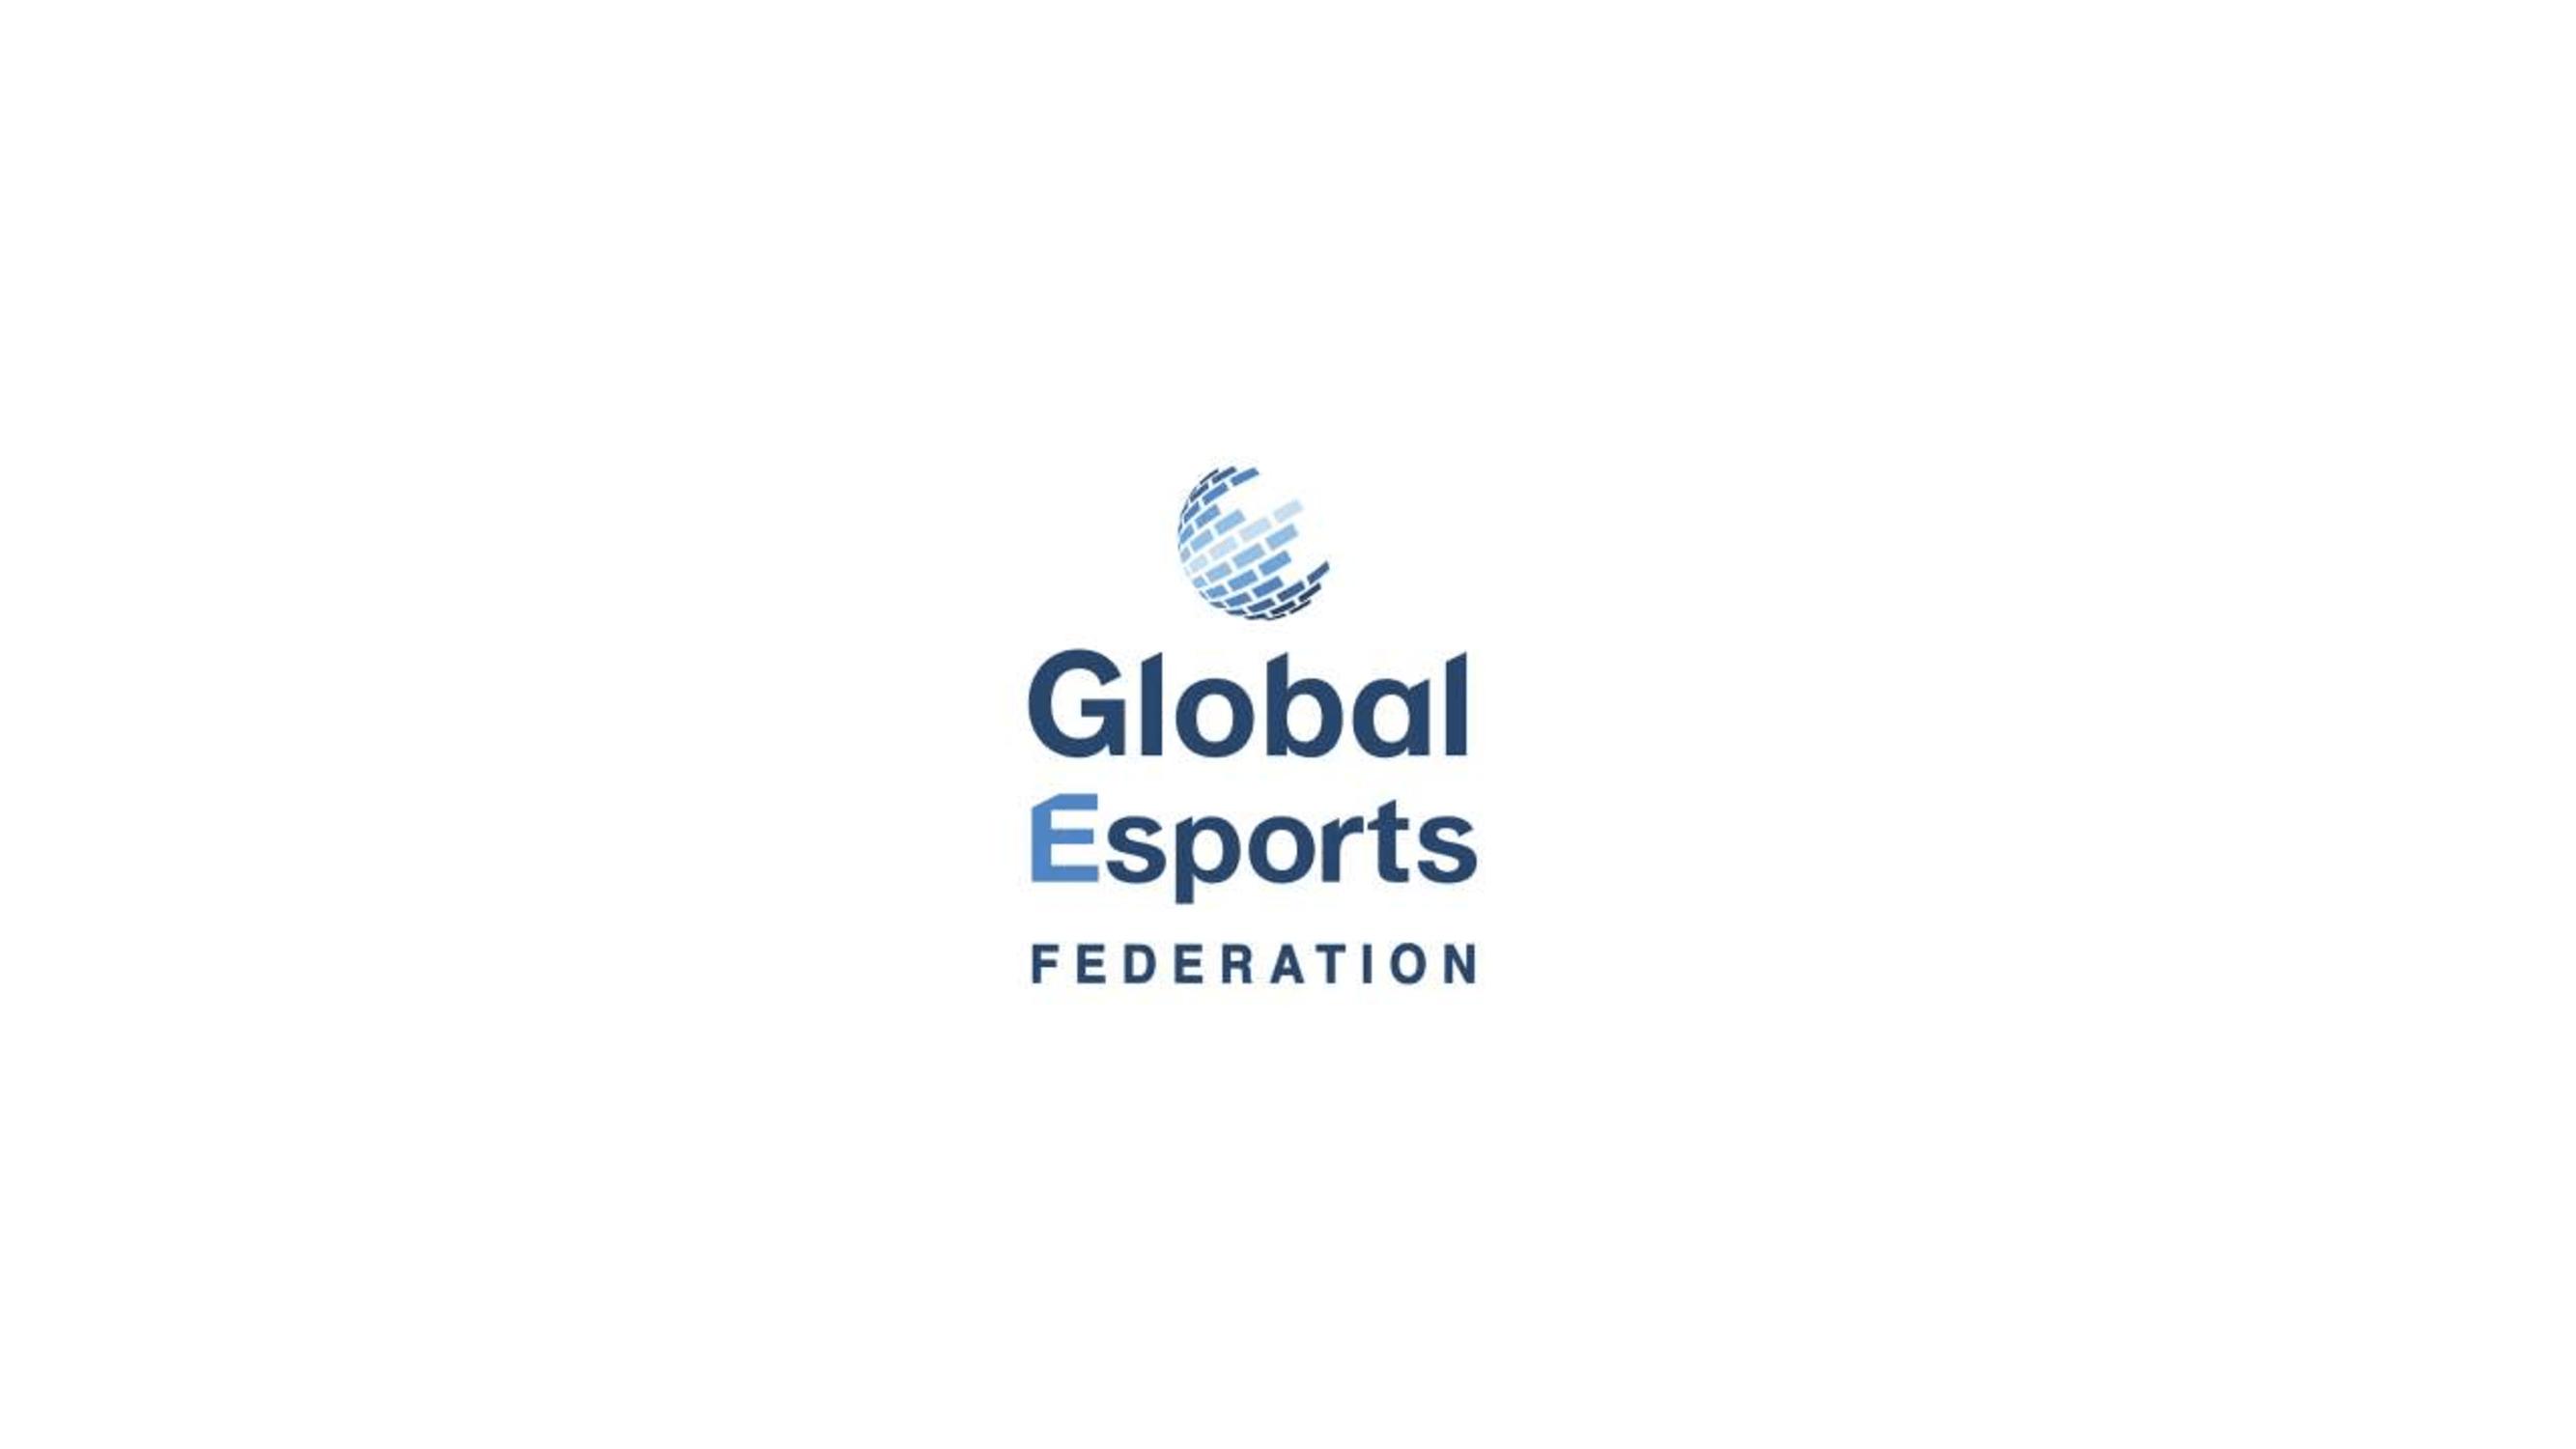 GlobalEsport